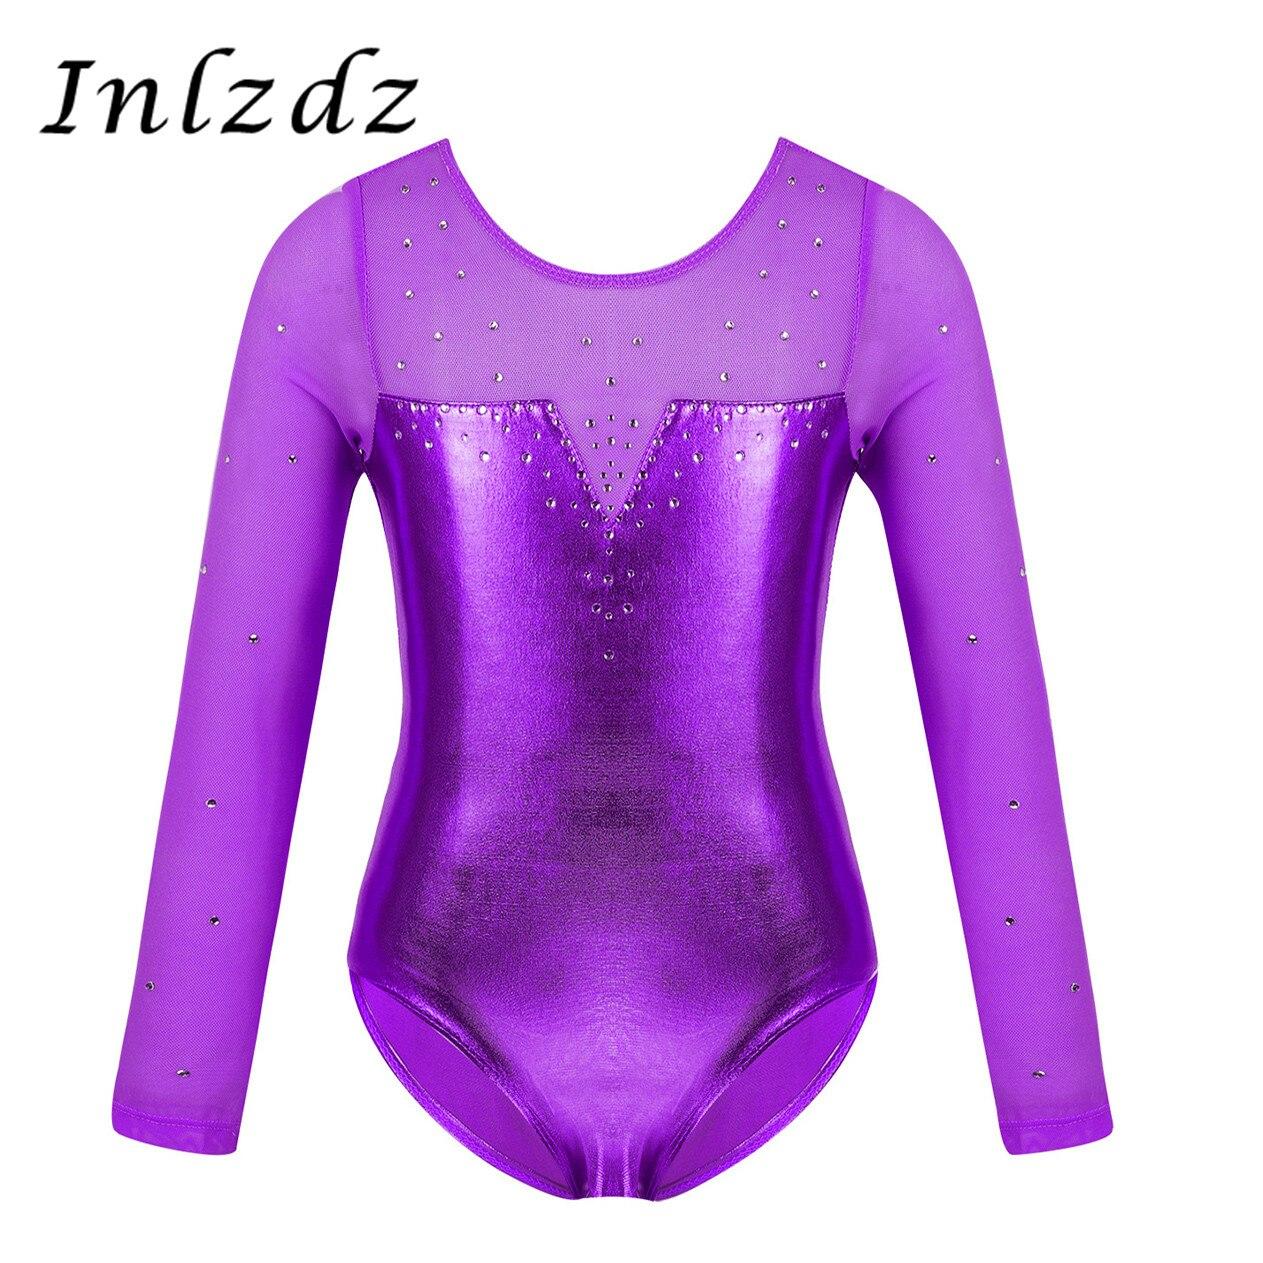 inlzdz Little Girls Long Sleeves Sparkle Gymnastic Athletic Leotard Dancing Ballet Leotard Dancewear Costumes